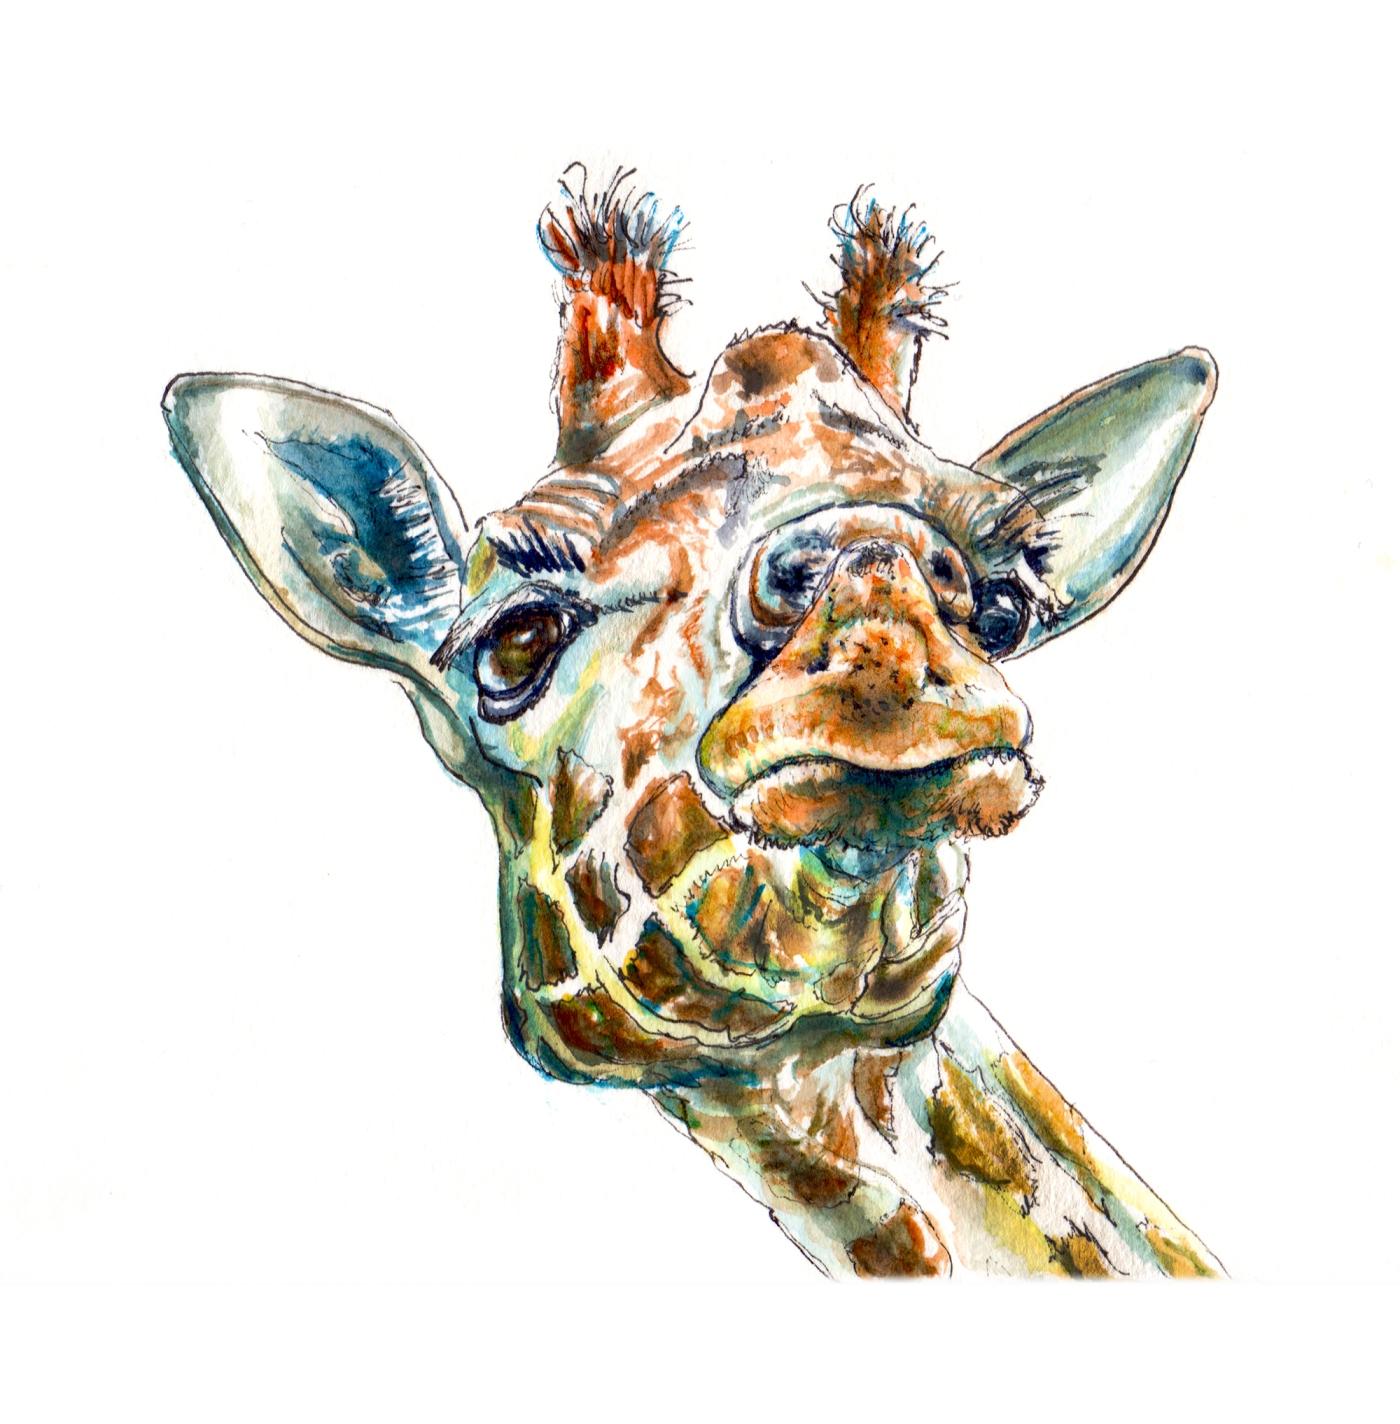 Day 16 - #WorldWatercolorGroup Funny Giraffe Face Watercolor - #doodlewash